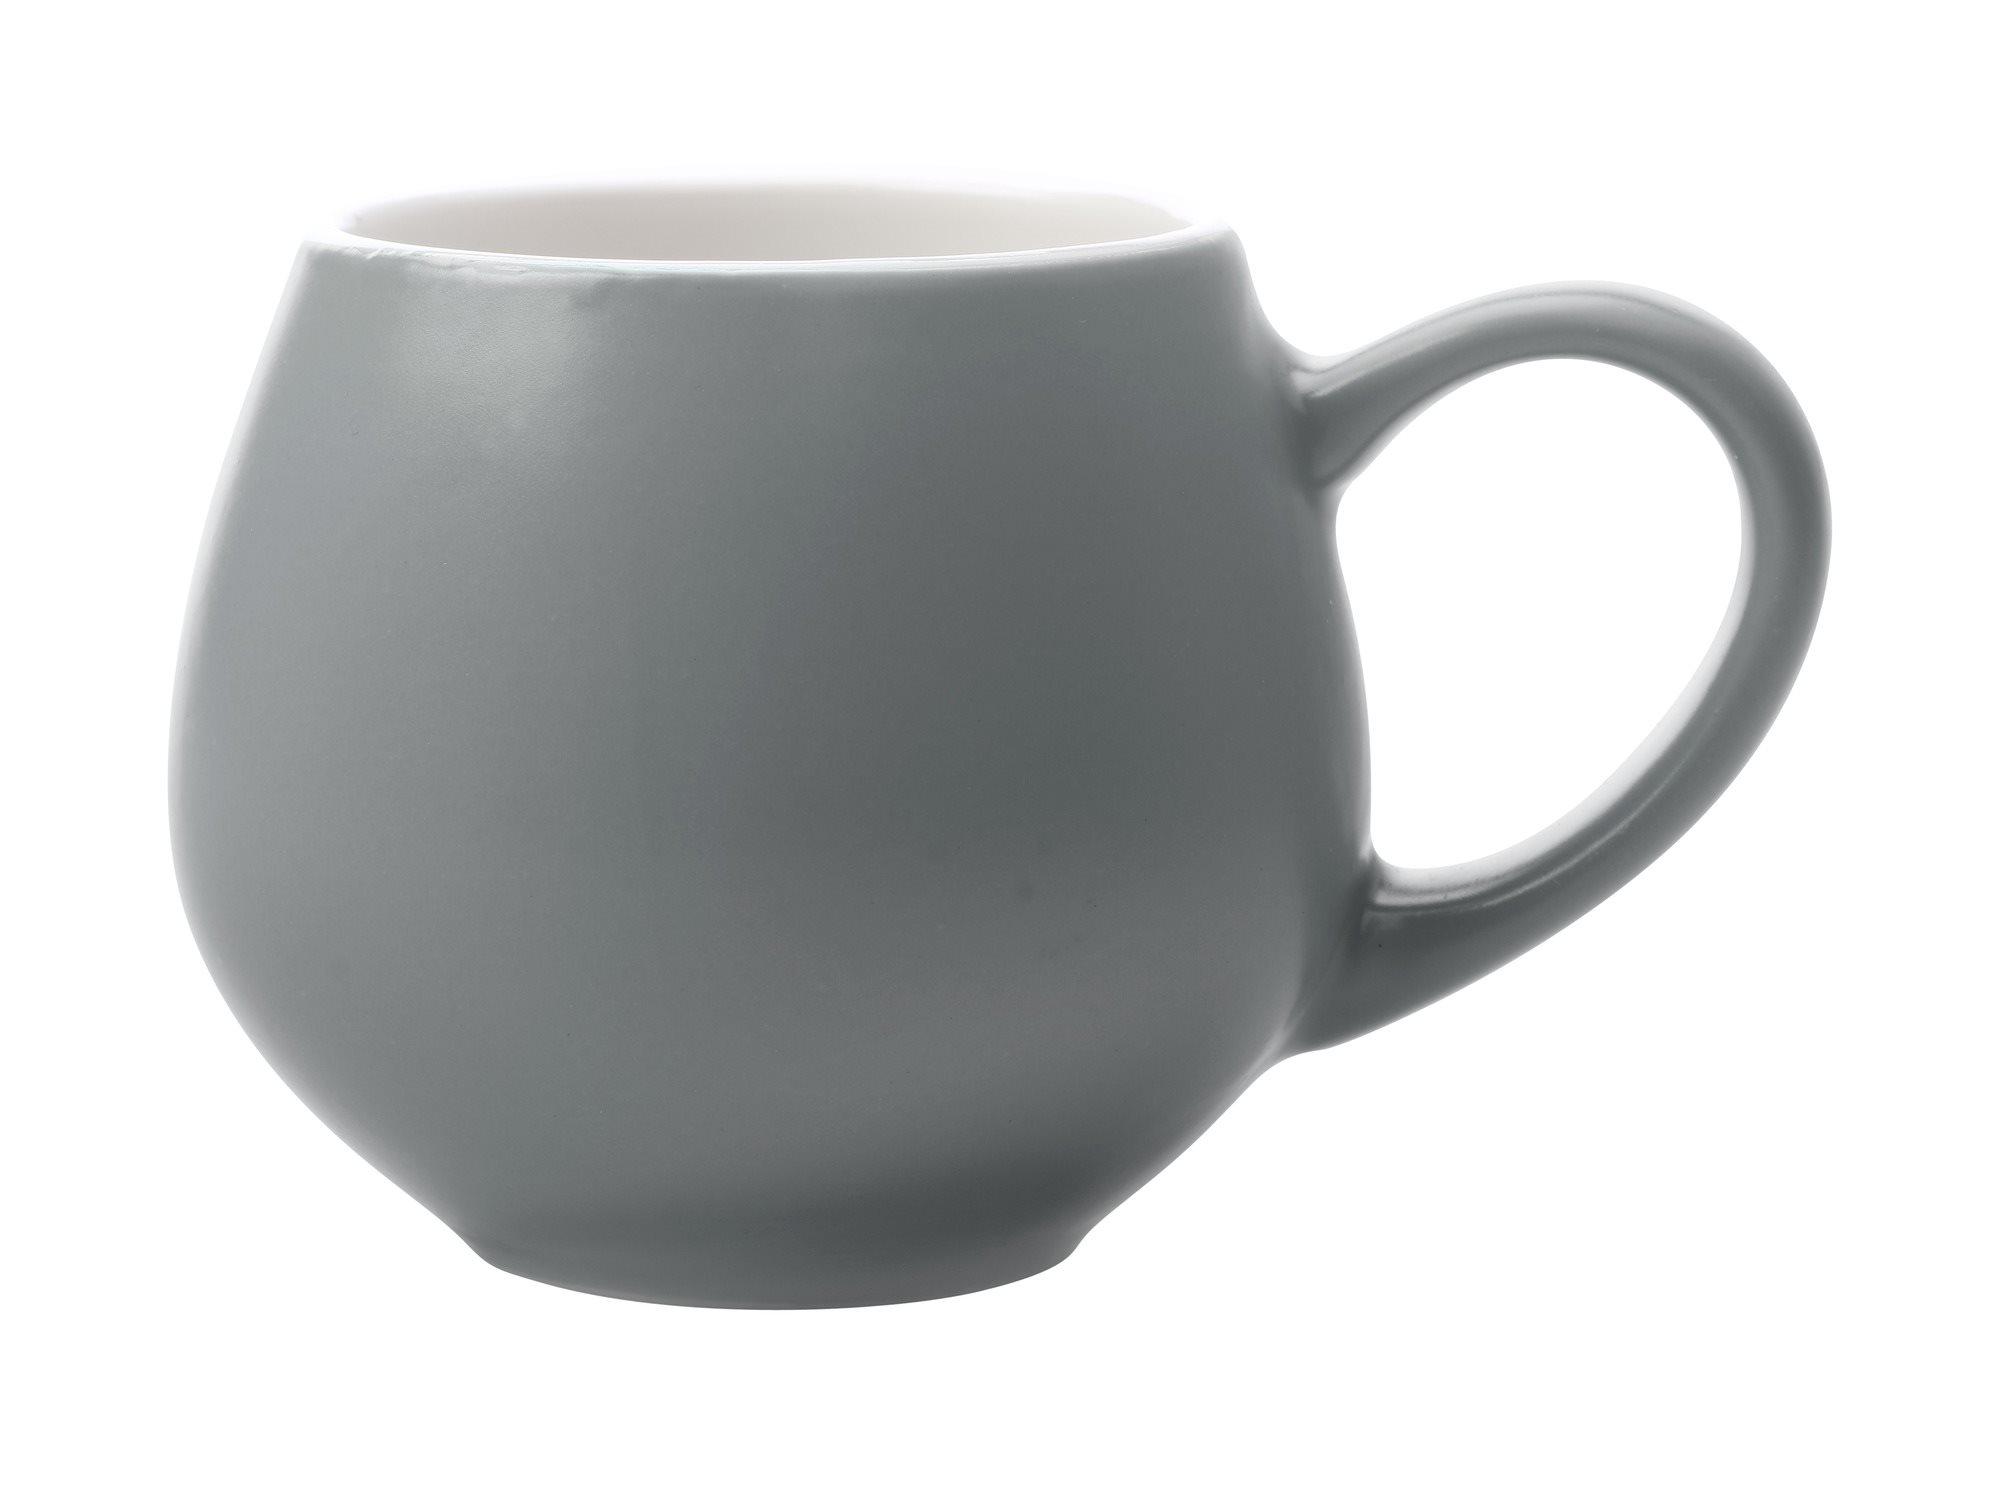 Maxwell & Williams Κούπα Mini Snug Γκρι Tint 120ml